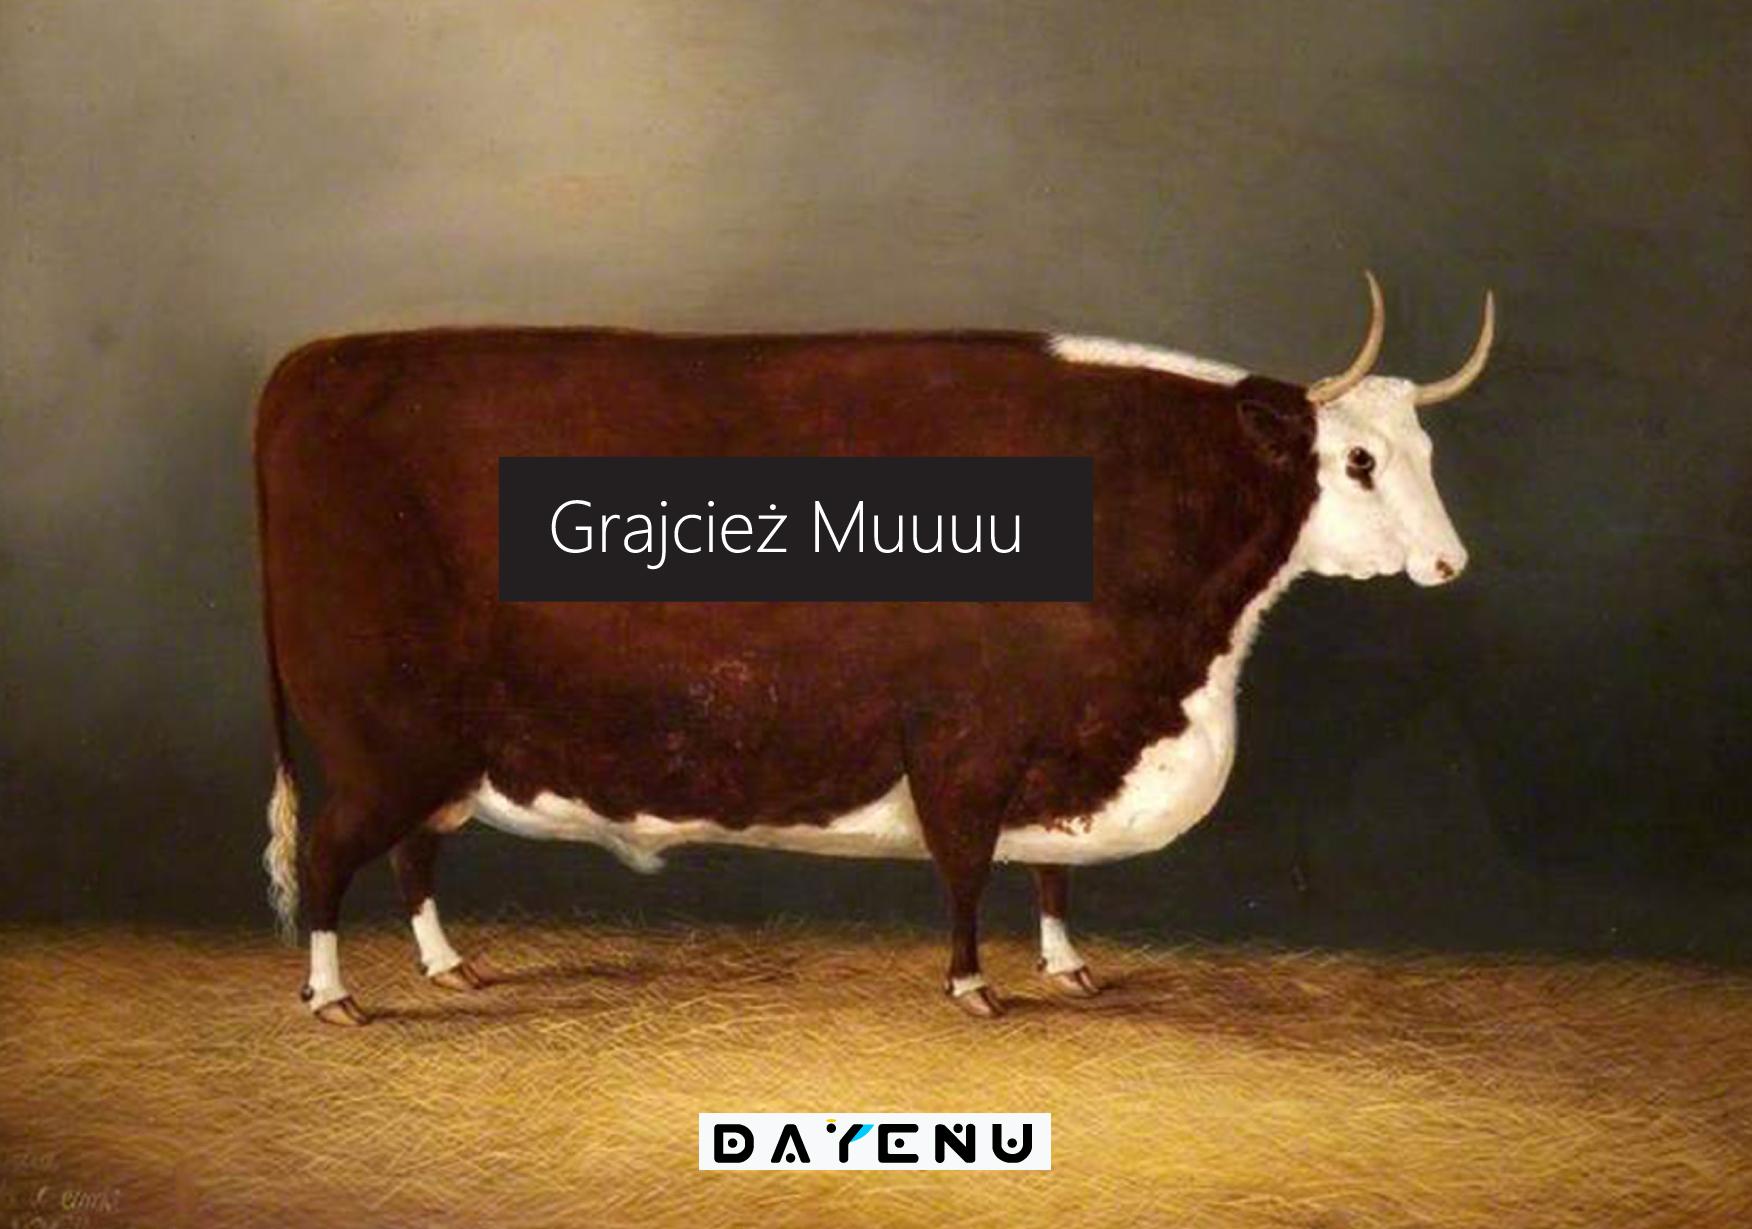 Grajcież Muuuu!